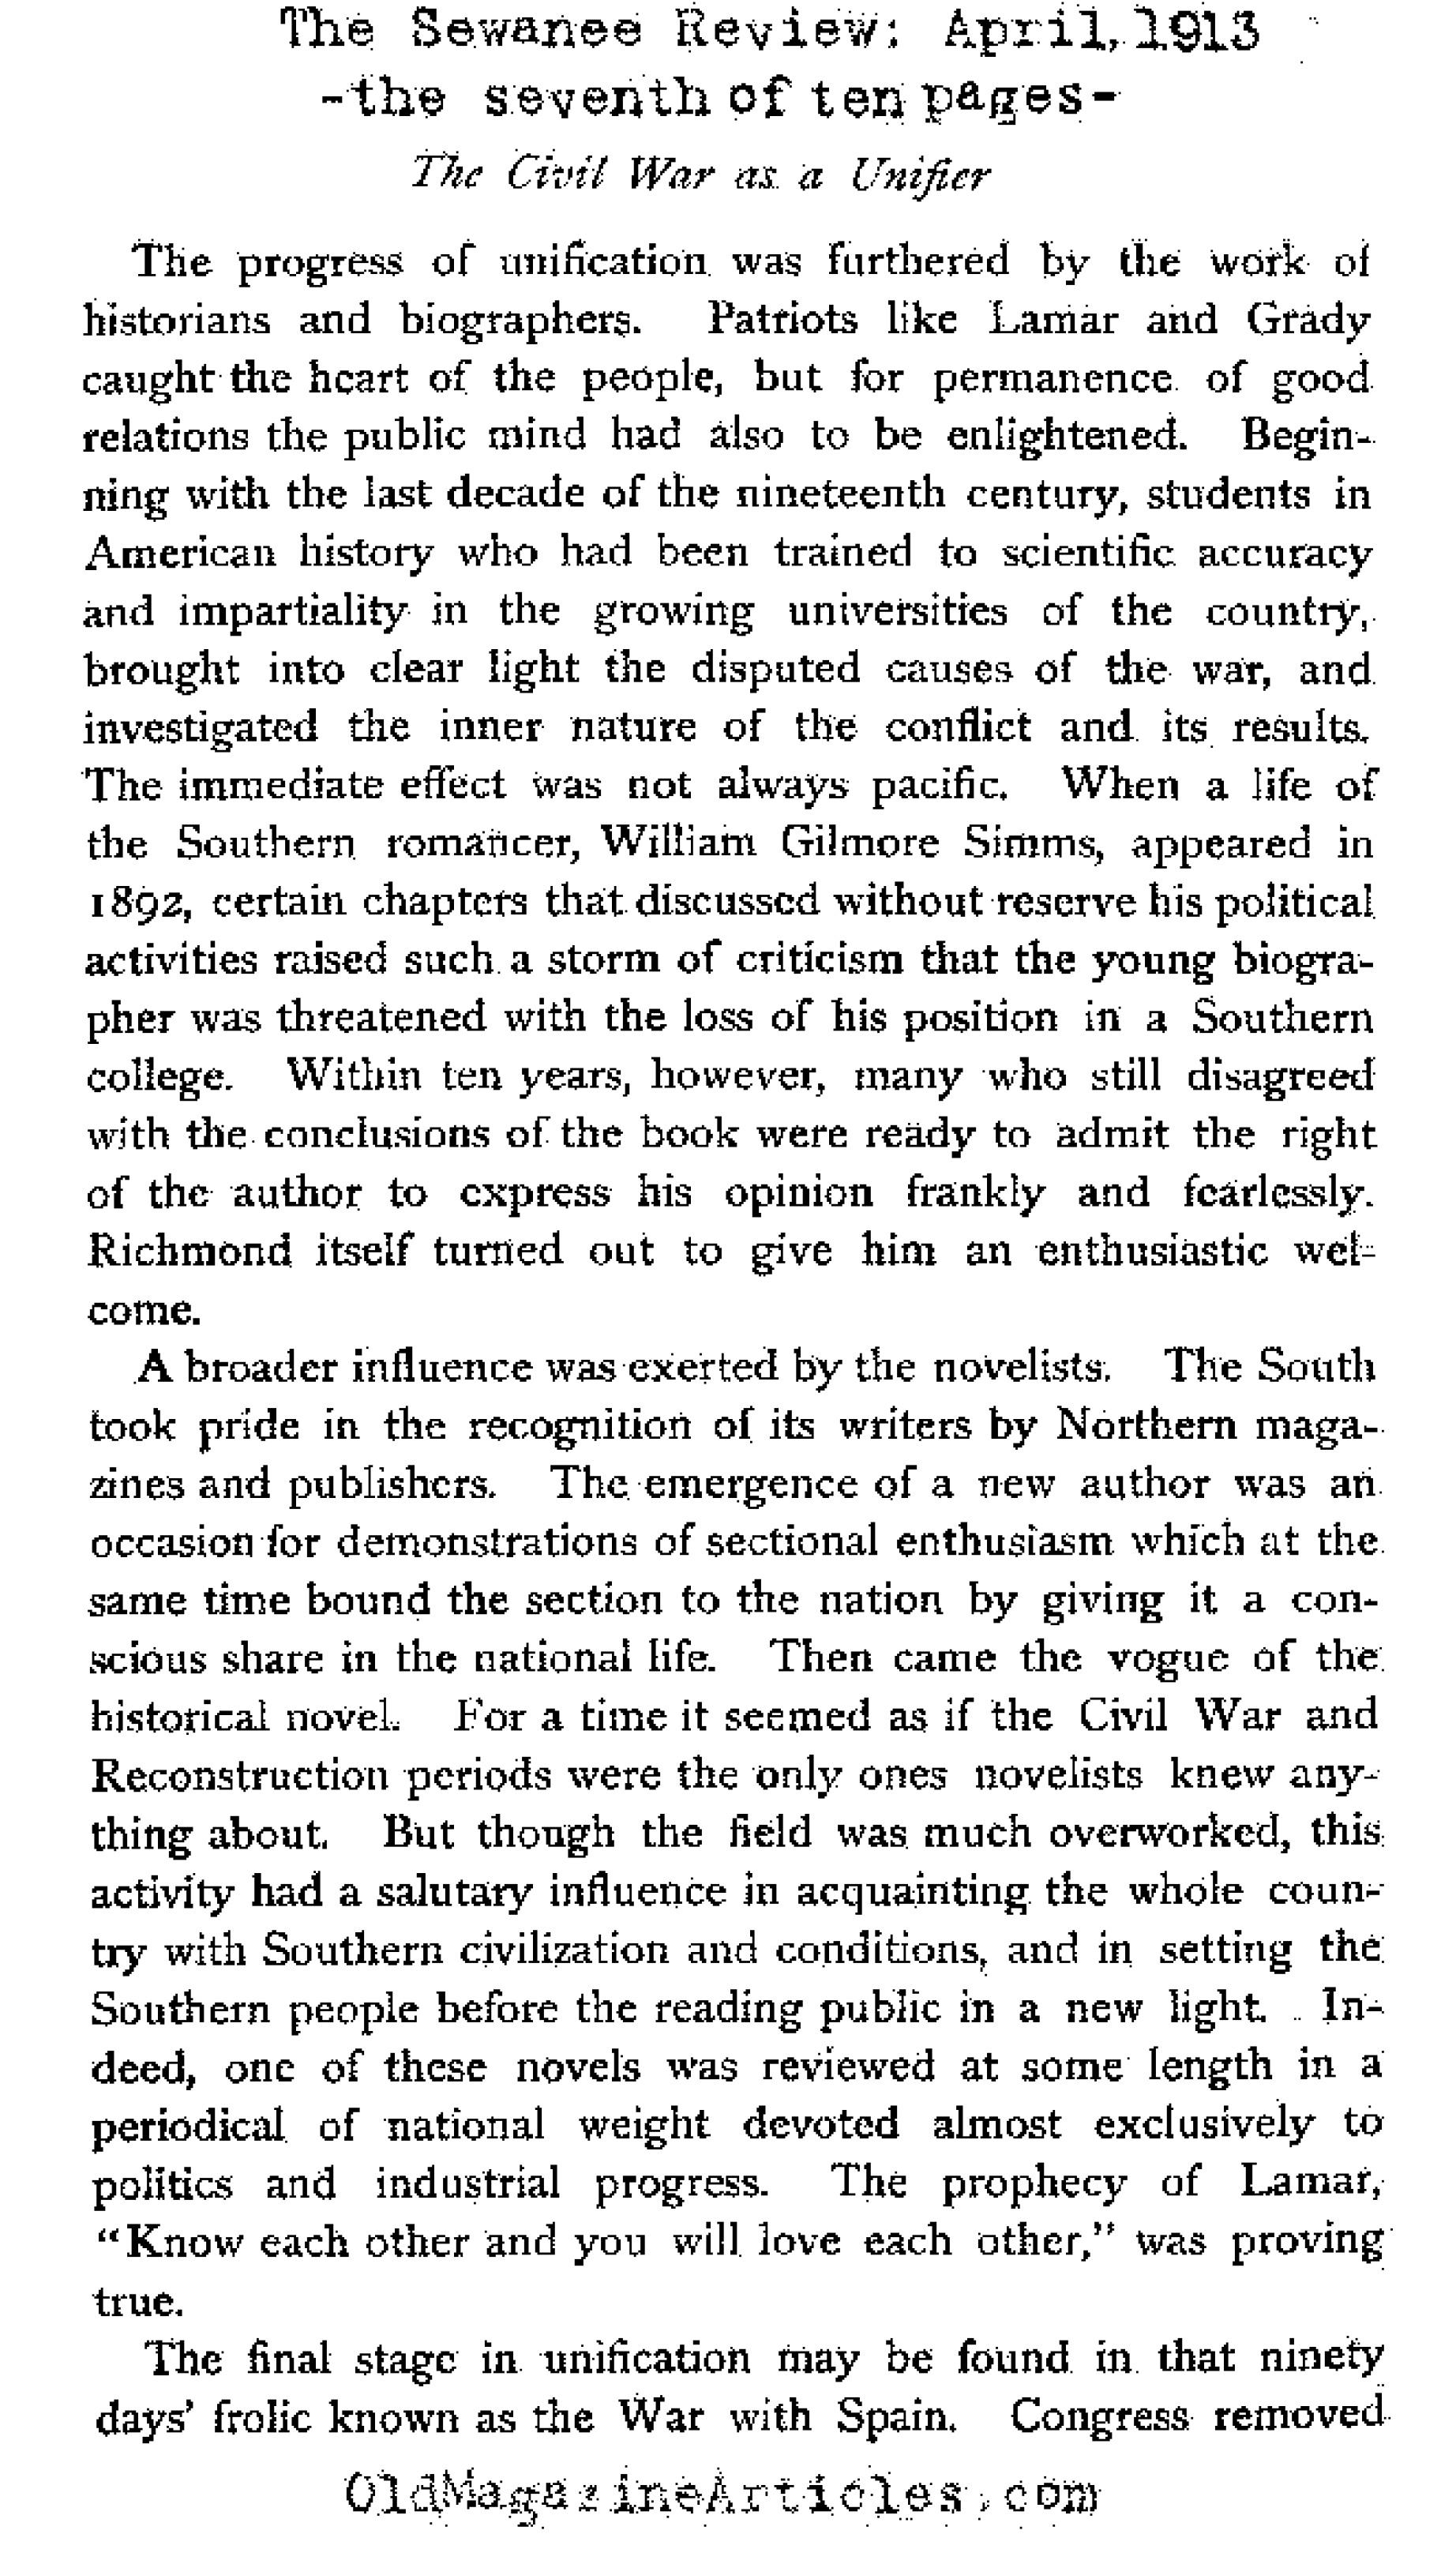 dudley historian of the american civil war civil war